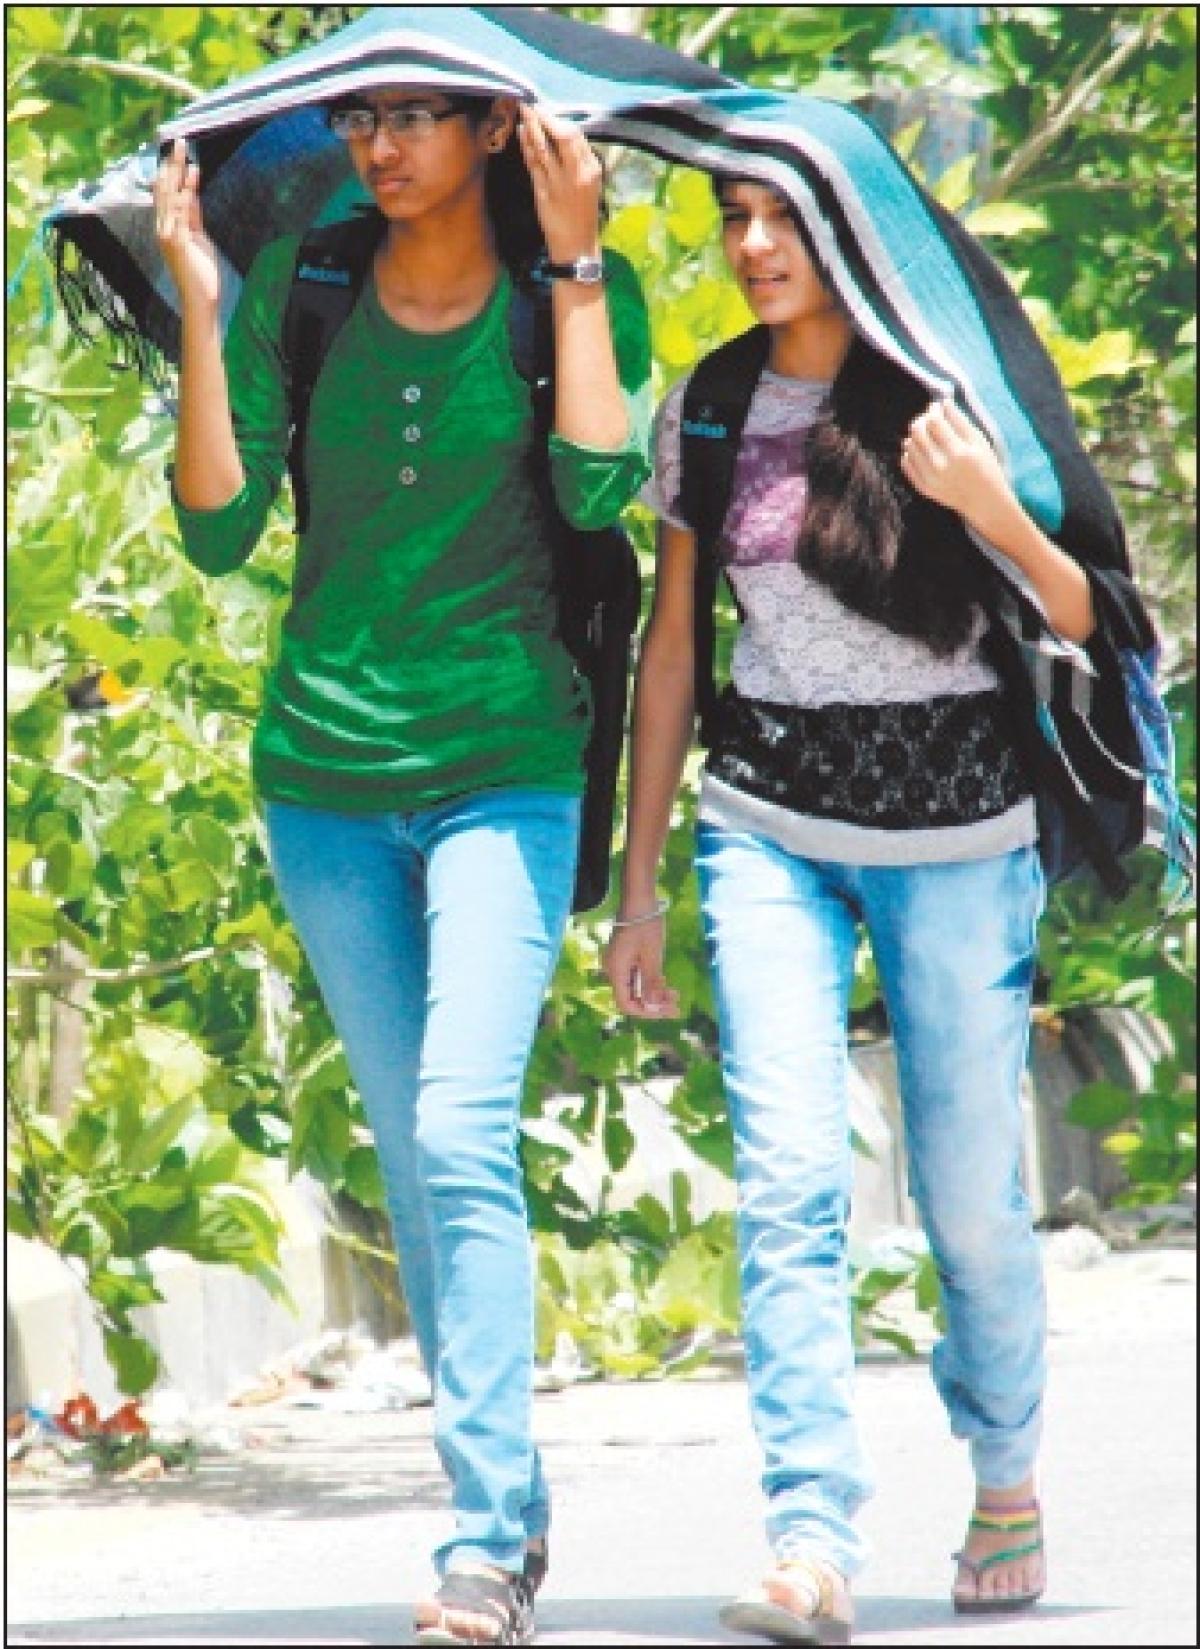 Indore: Hot Sunday, mercury touches 39 degrees Celsius mark